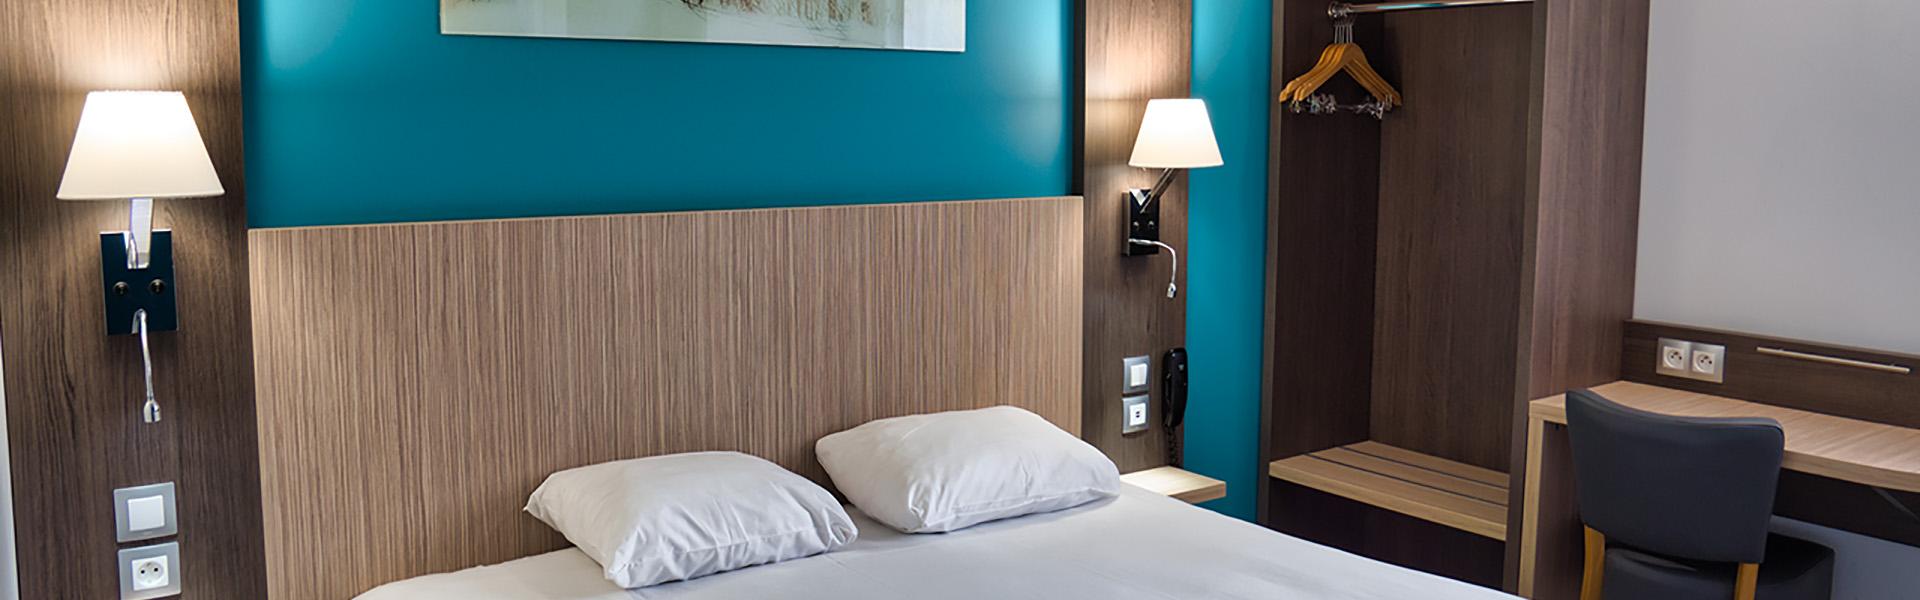 hotel_le_seinomarin_accueil_slider_chambre_bleu